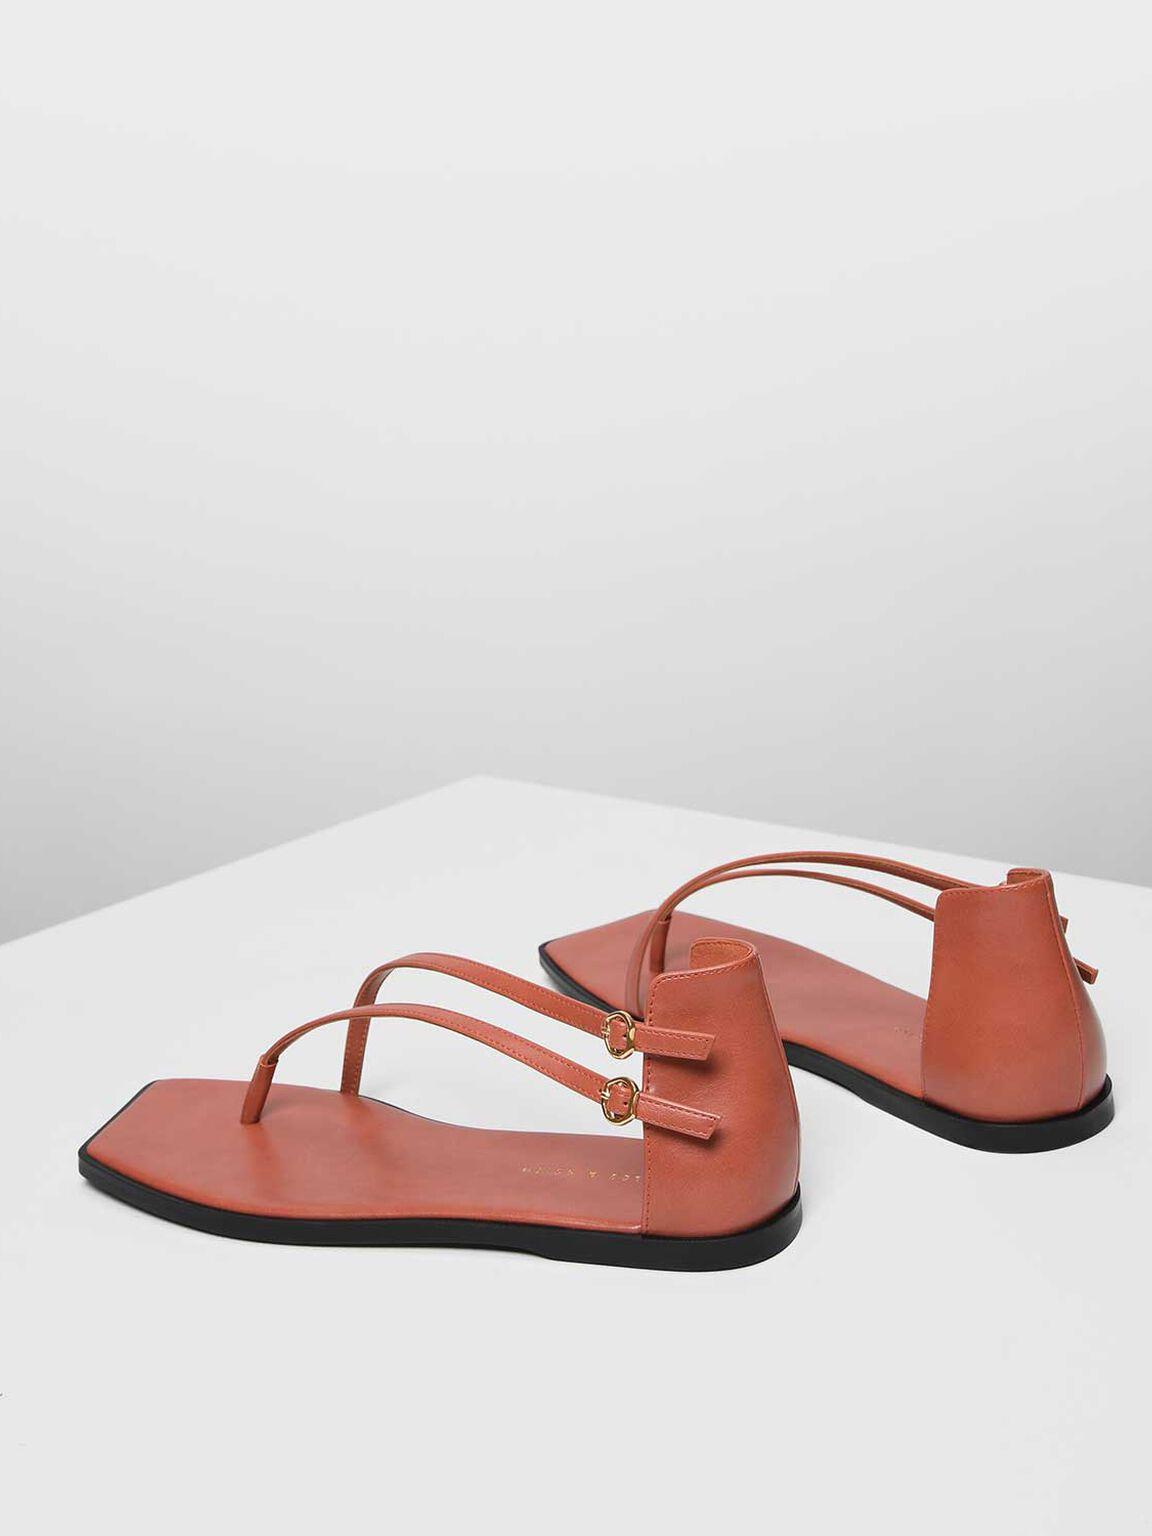 Asymmetrical Strap Thong Sandals, Orange, hi-res